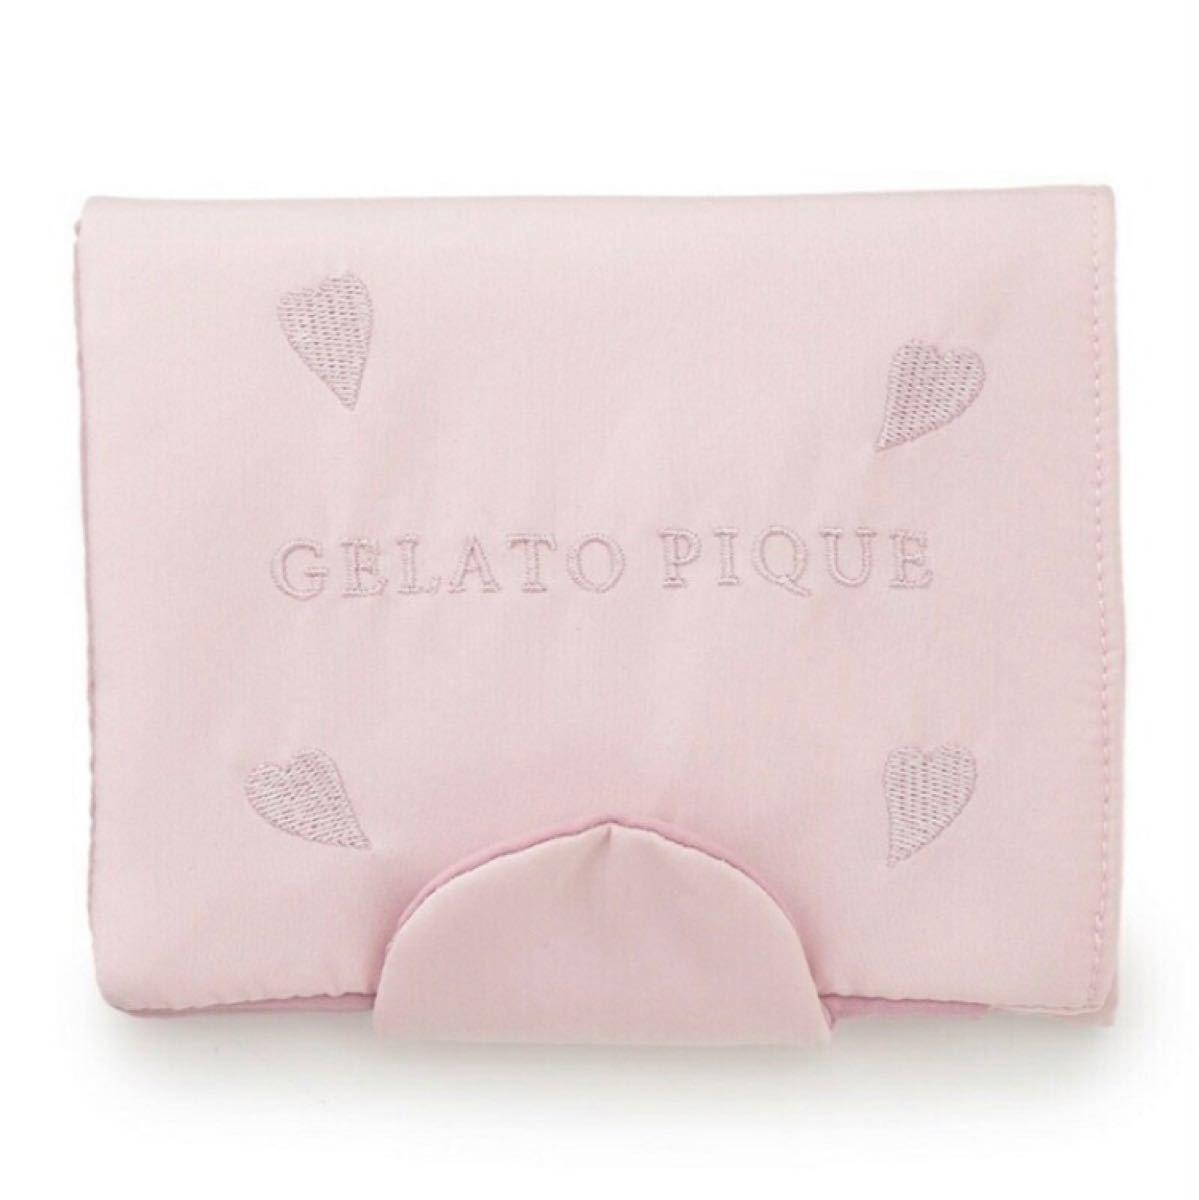 gelato pique(ジェラート ピケ)【SAKURA FAIR】マスクポーチ